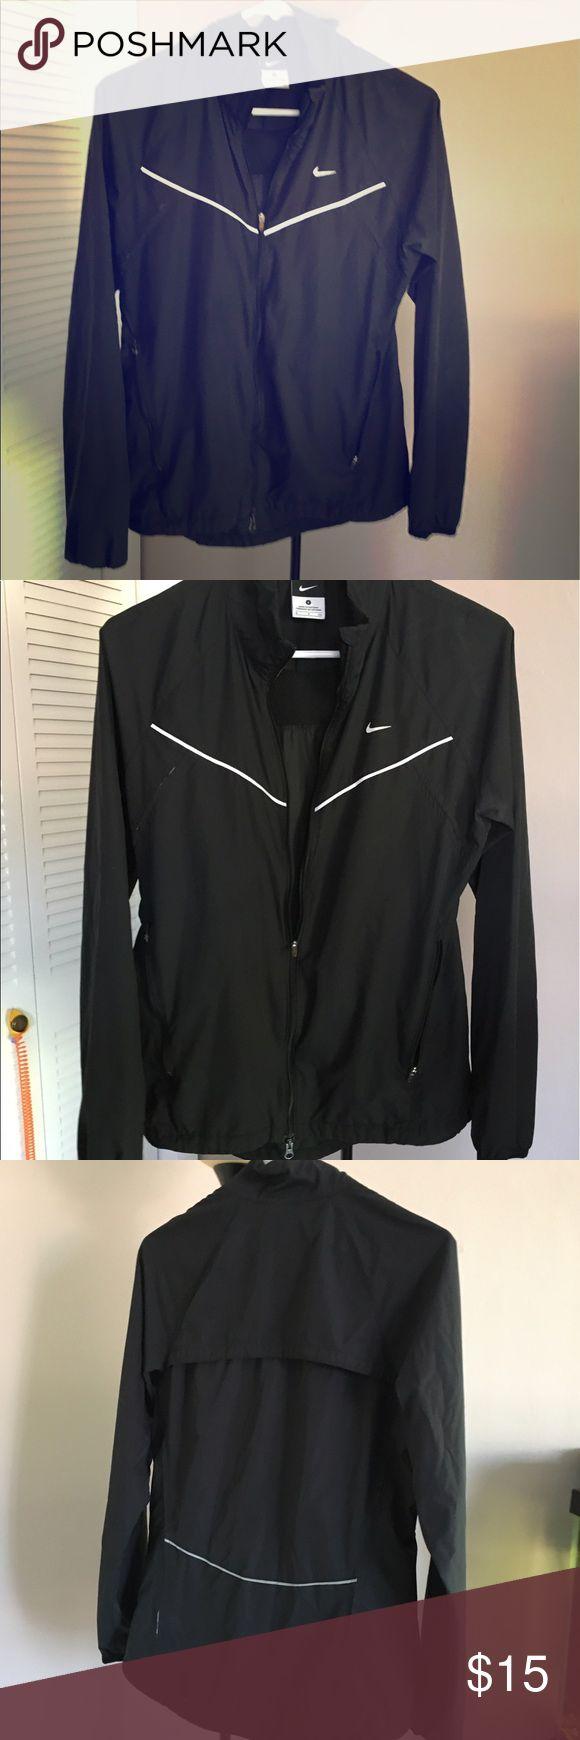 Nike black windbreaker Nike black windbreaker, very light and thin fabric Nike Jackets & Coats Utility Jackets